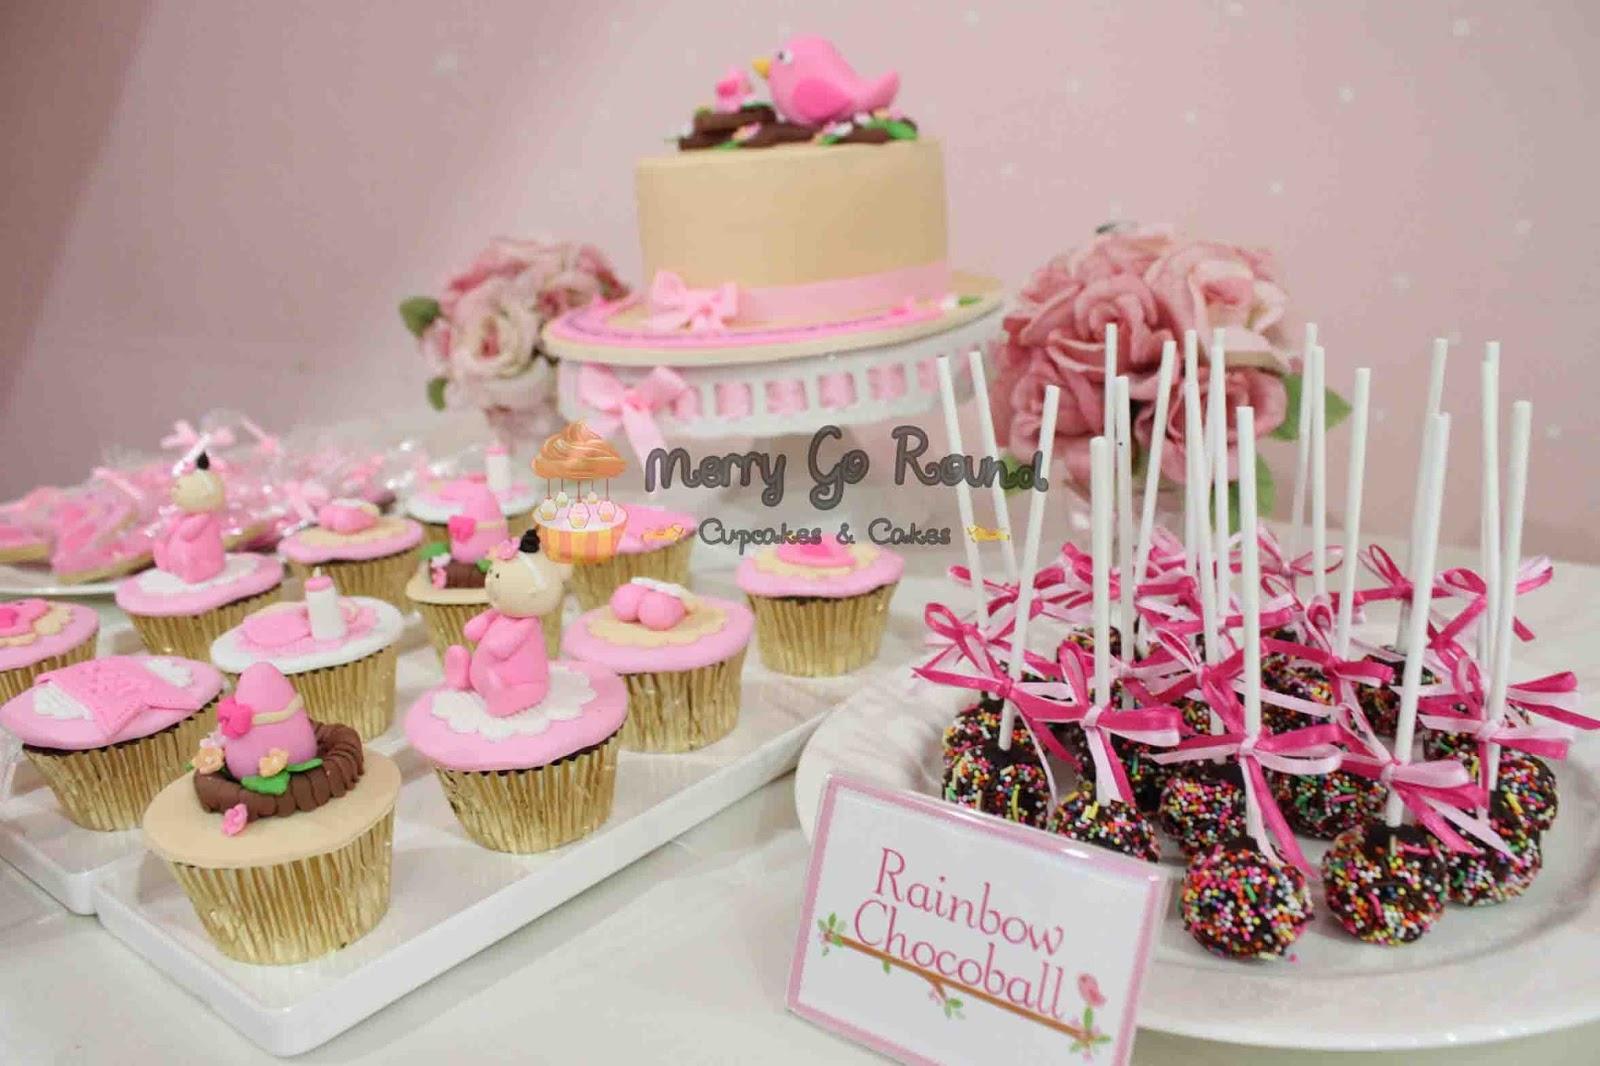 Merry Go Round Cupcakes Amp Cakes Dessert Table